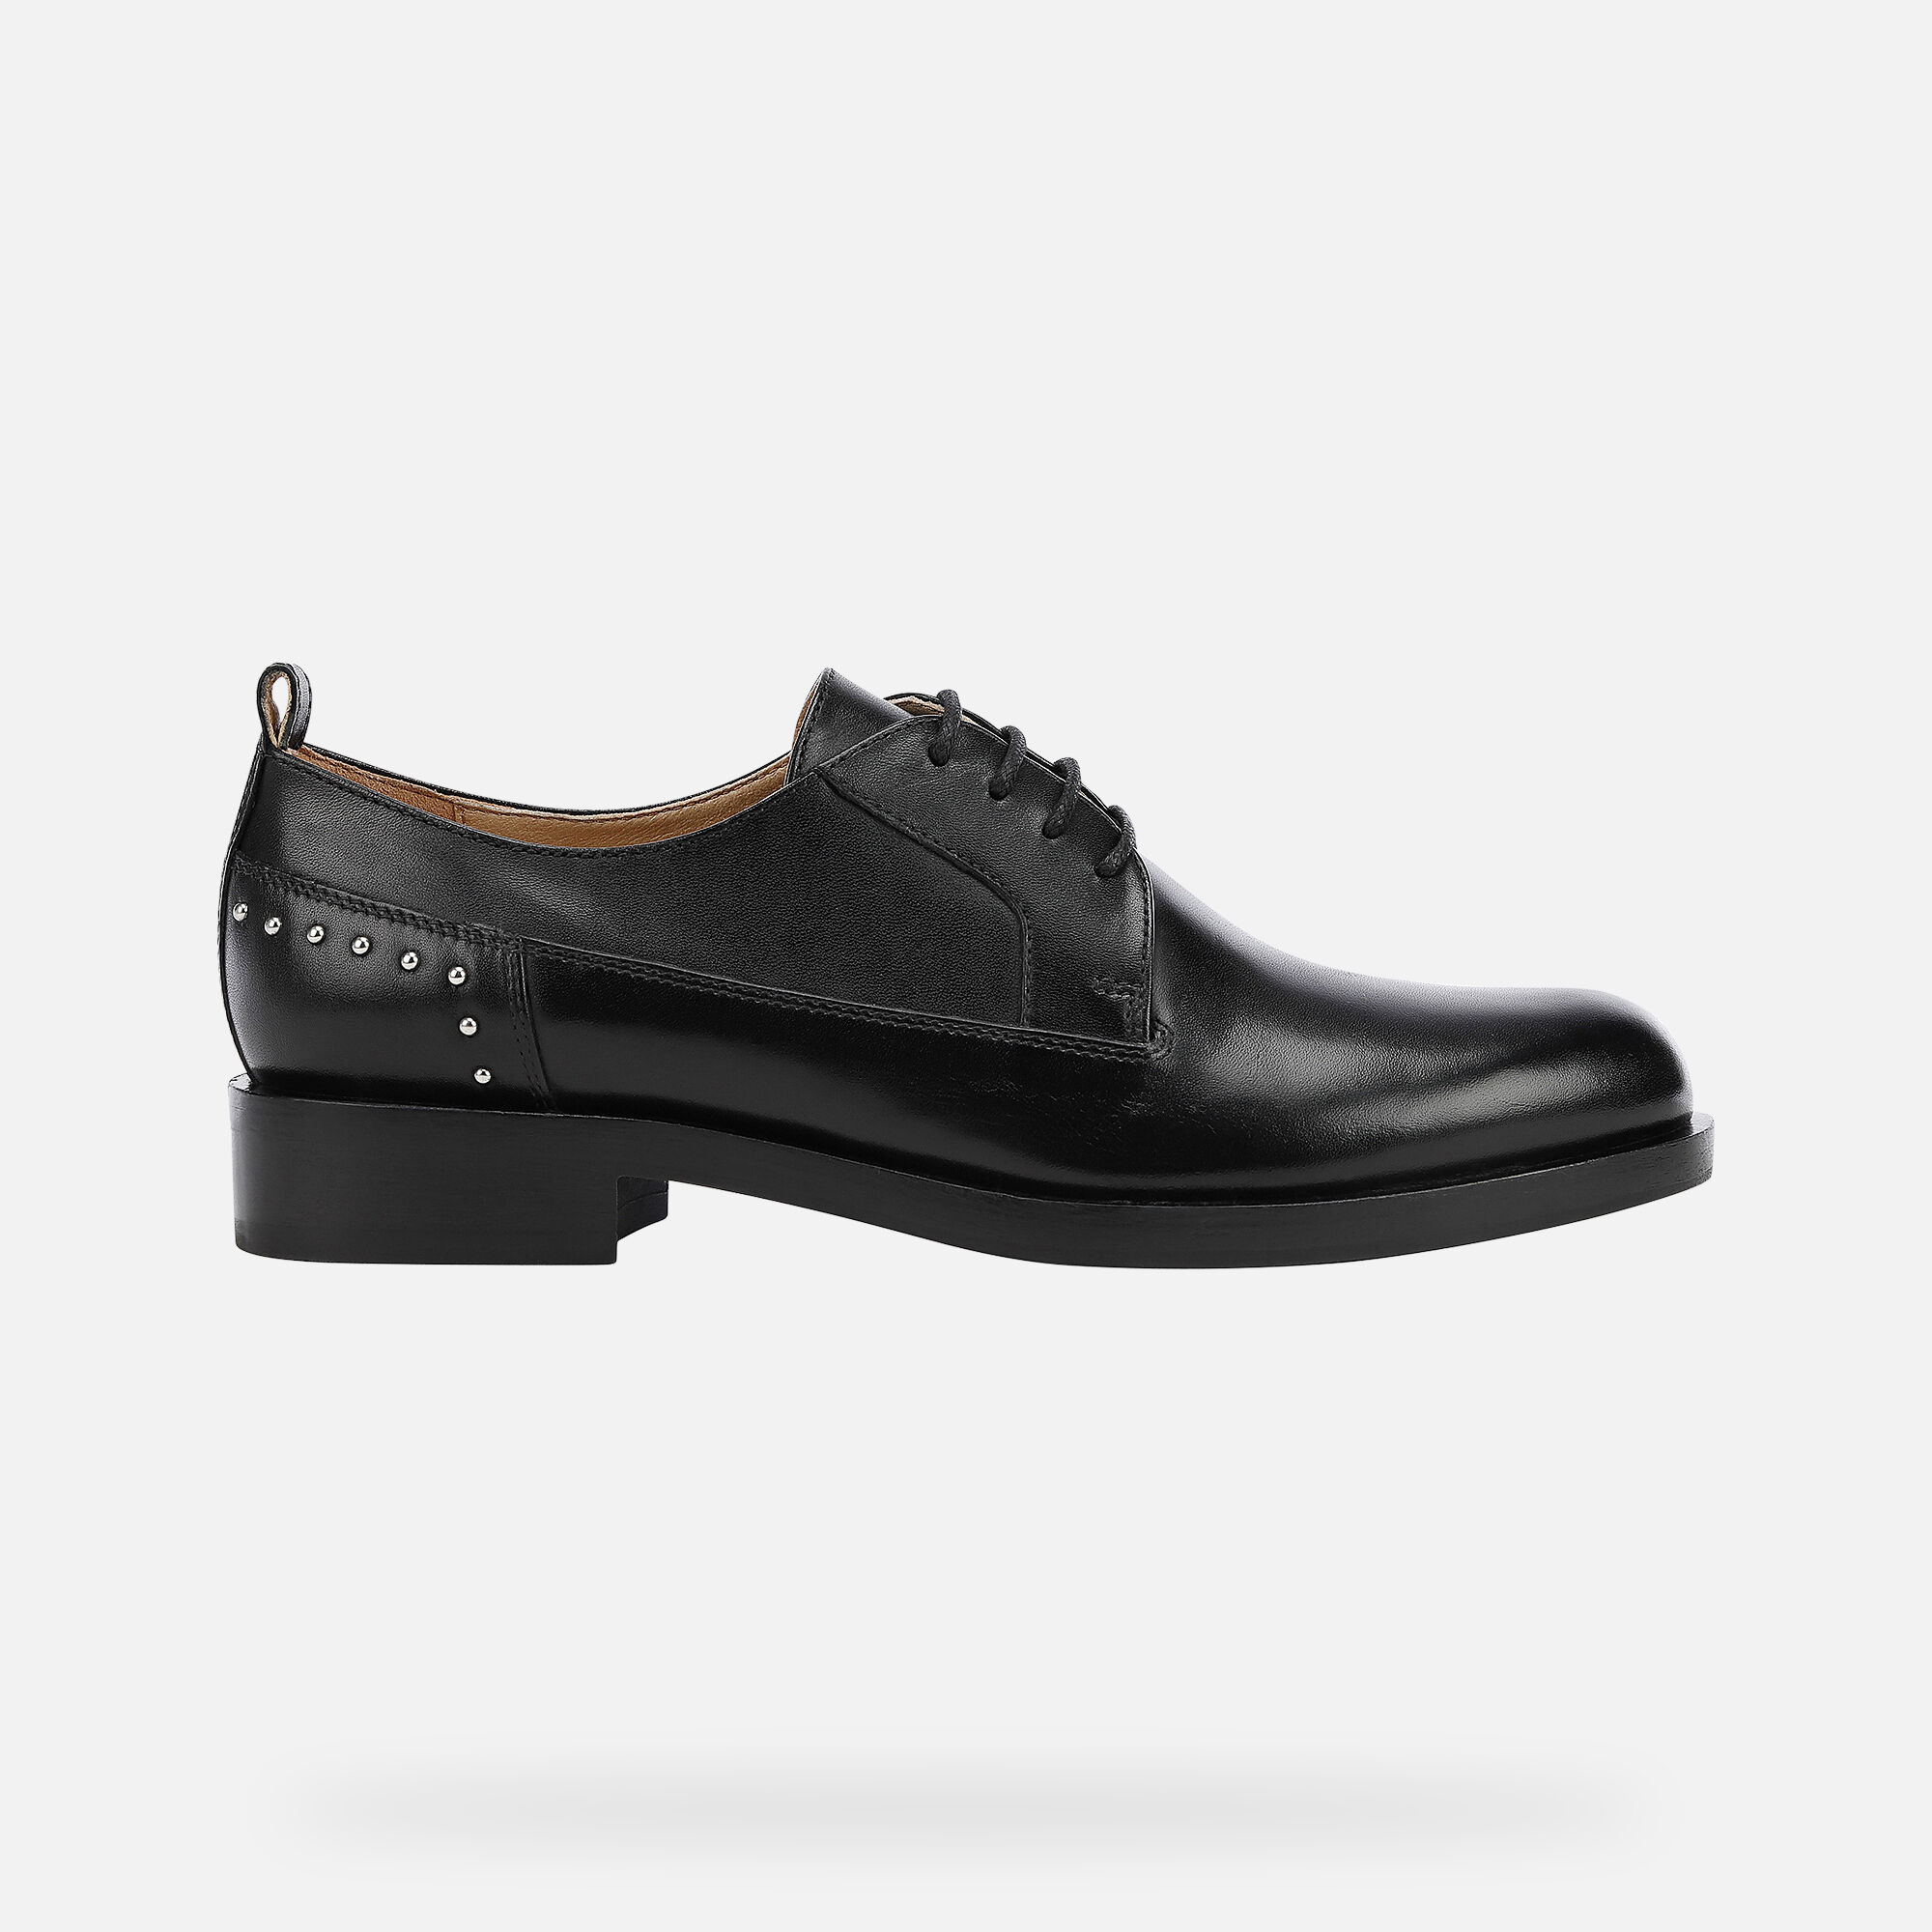 Geox BROGUE S Damen: Schwarze Schuhe   Geox® FW2021